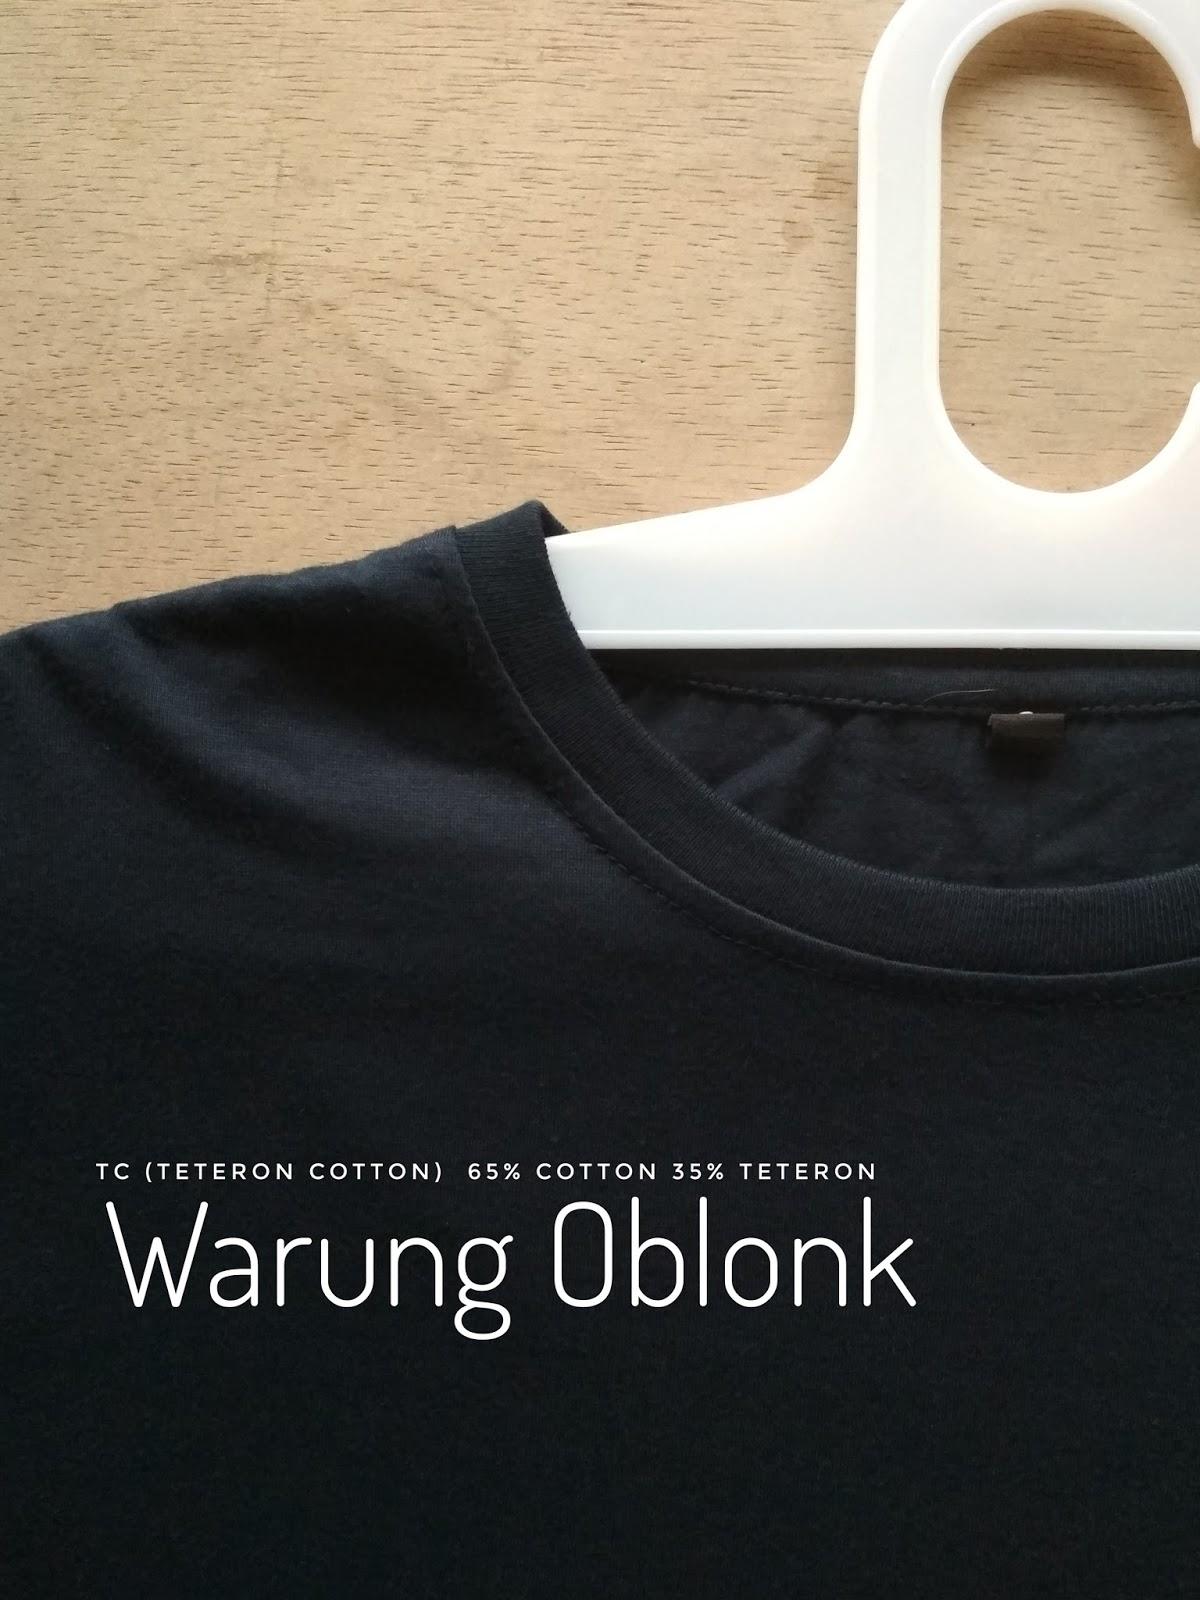 Konveksi Sablon Bordir Grosir Kaos Polos Terlengkap Termurah Black Misty Putih Hitam Biru Benhur Dongker Hijau Fuji Kuning Merah Abu Muda